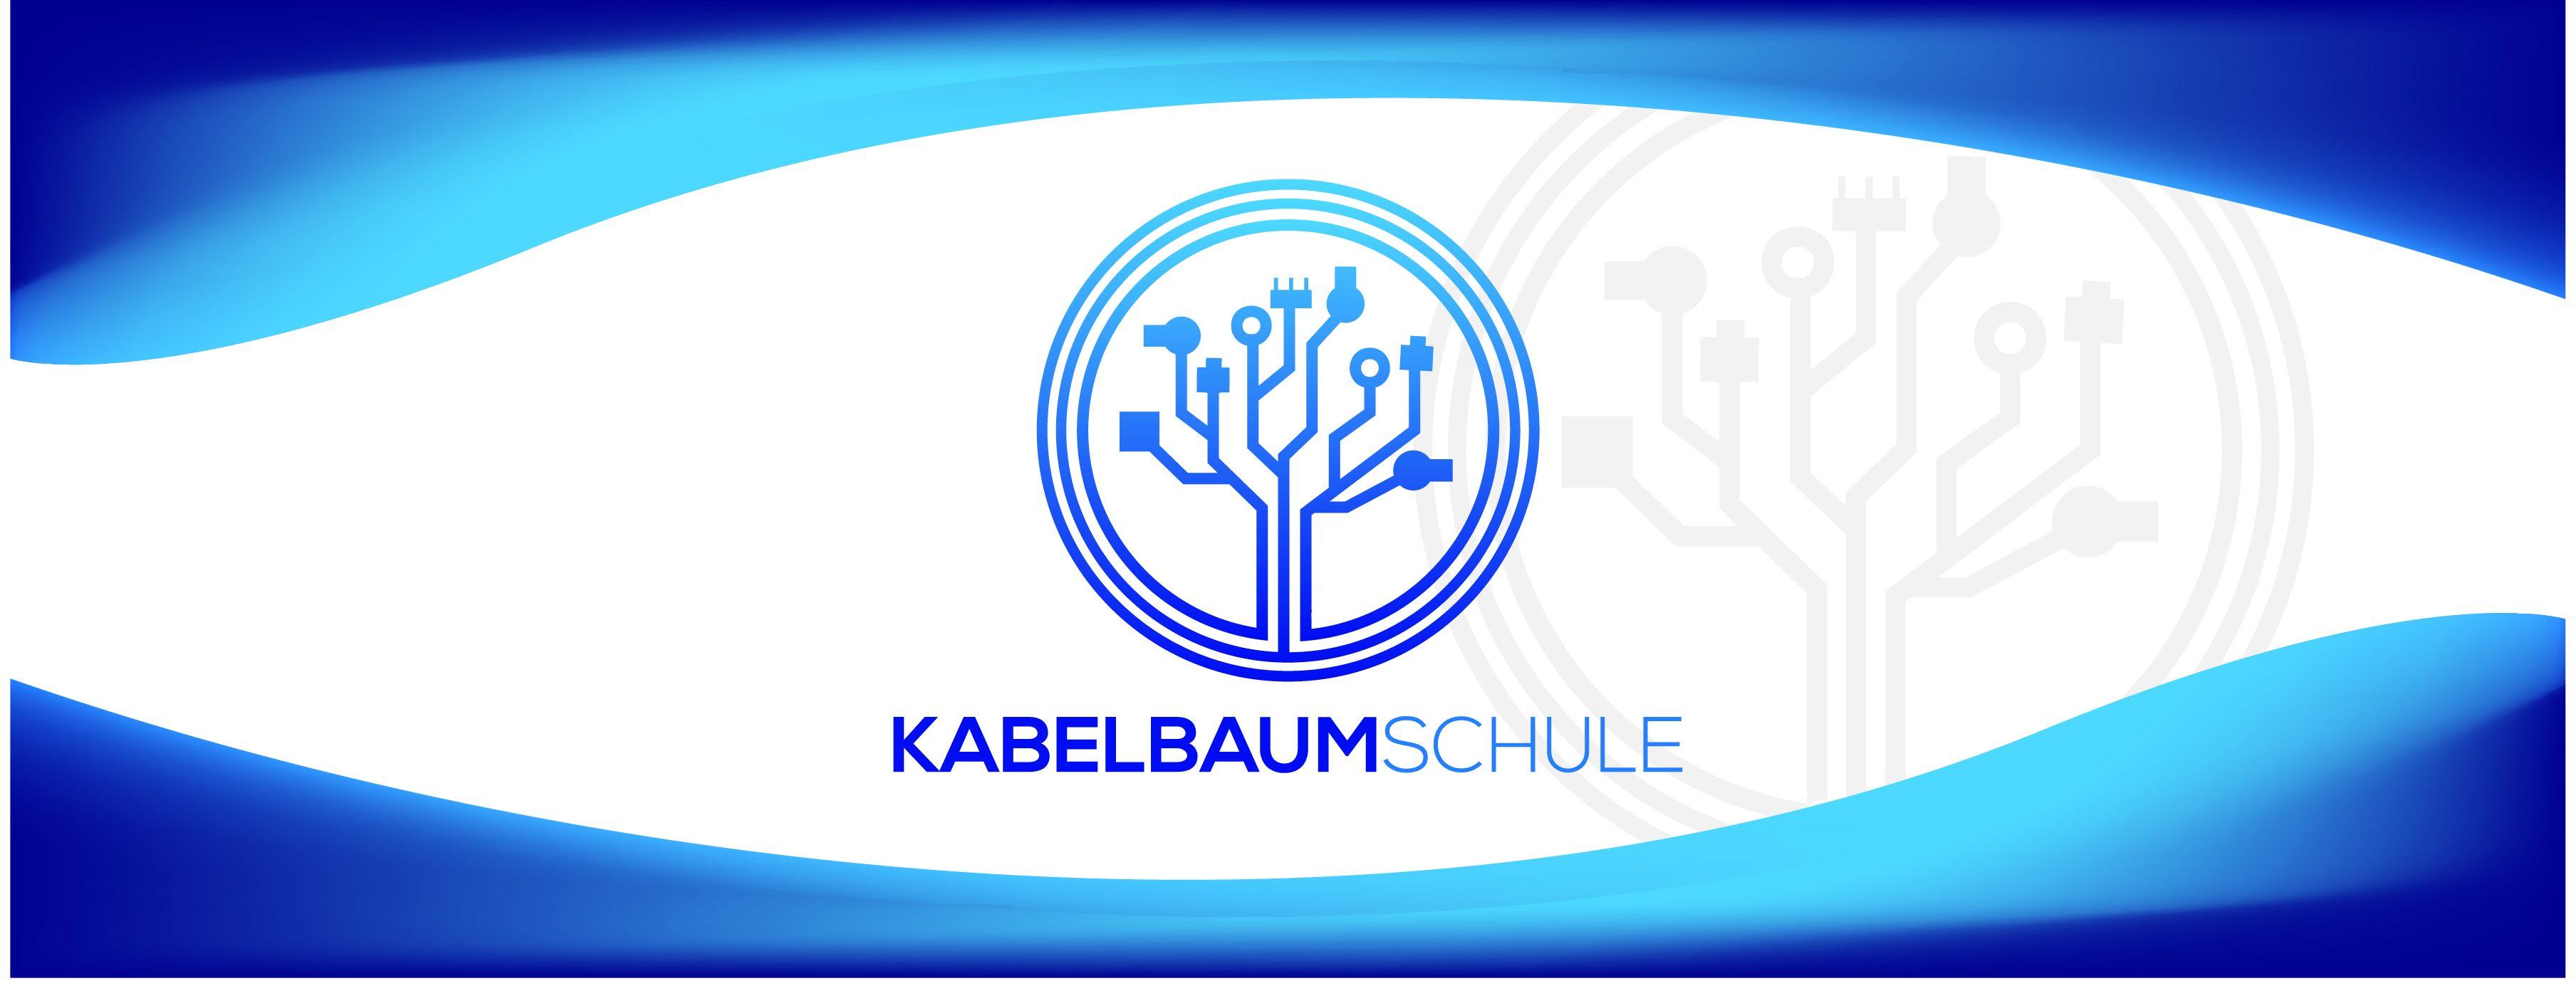 Kabelbaumschule